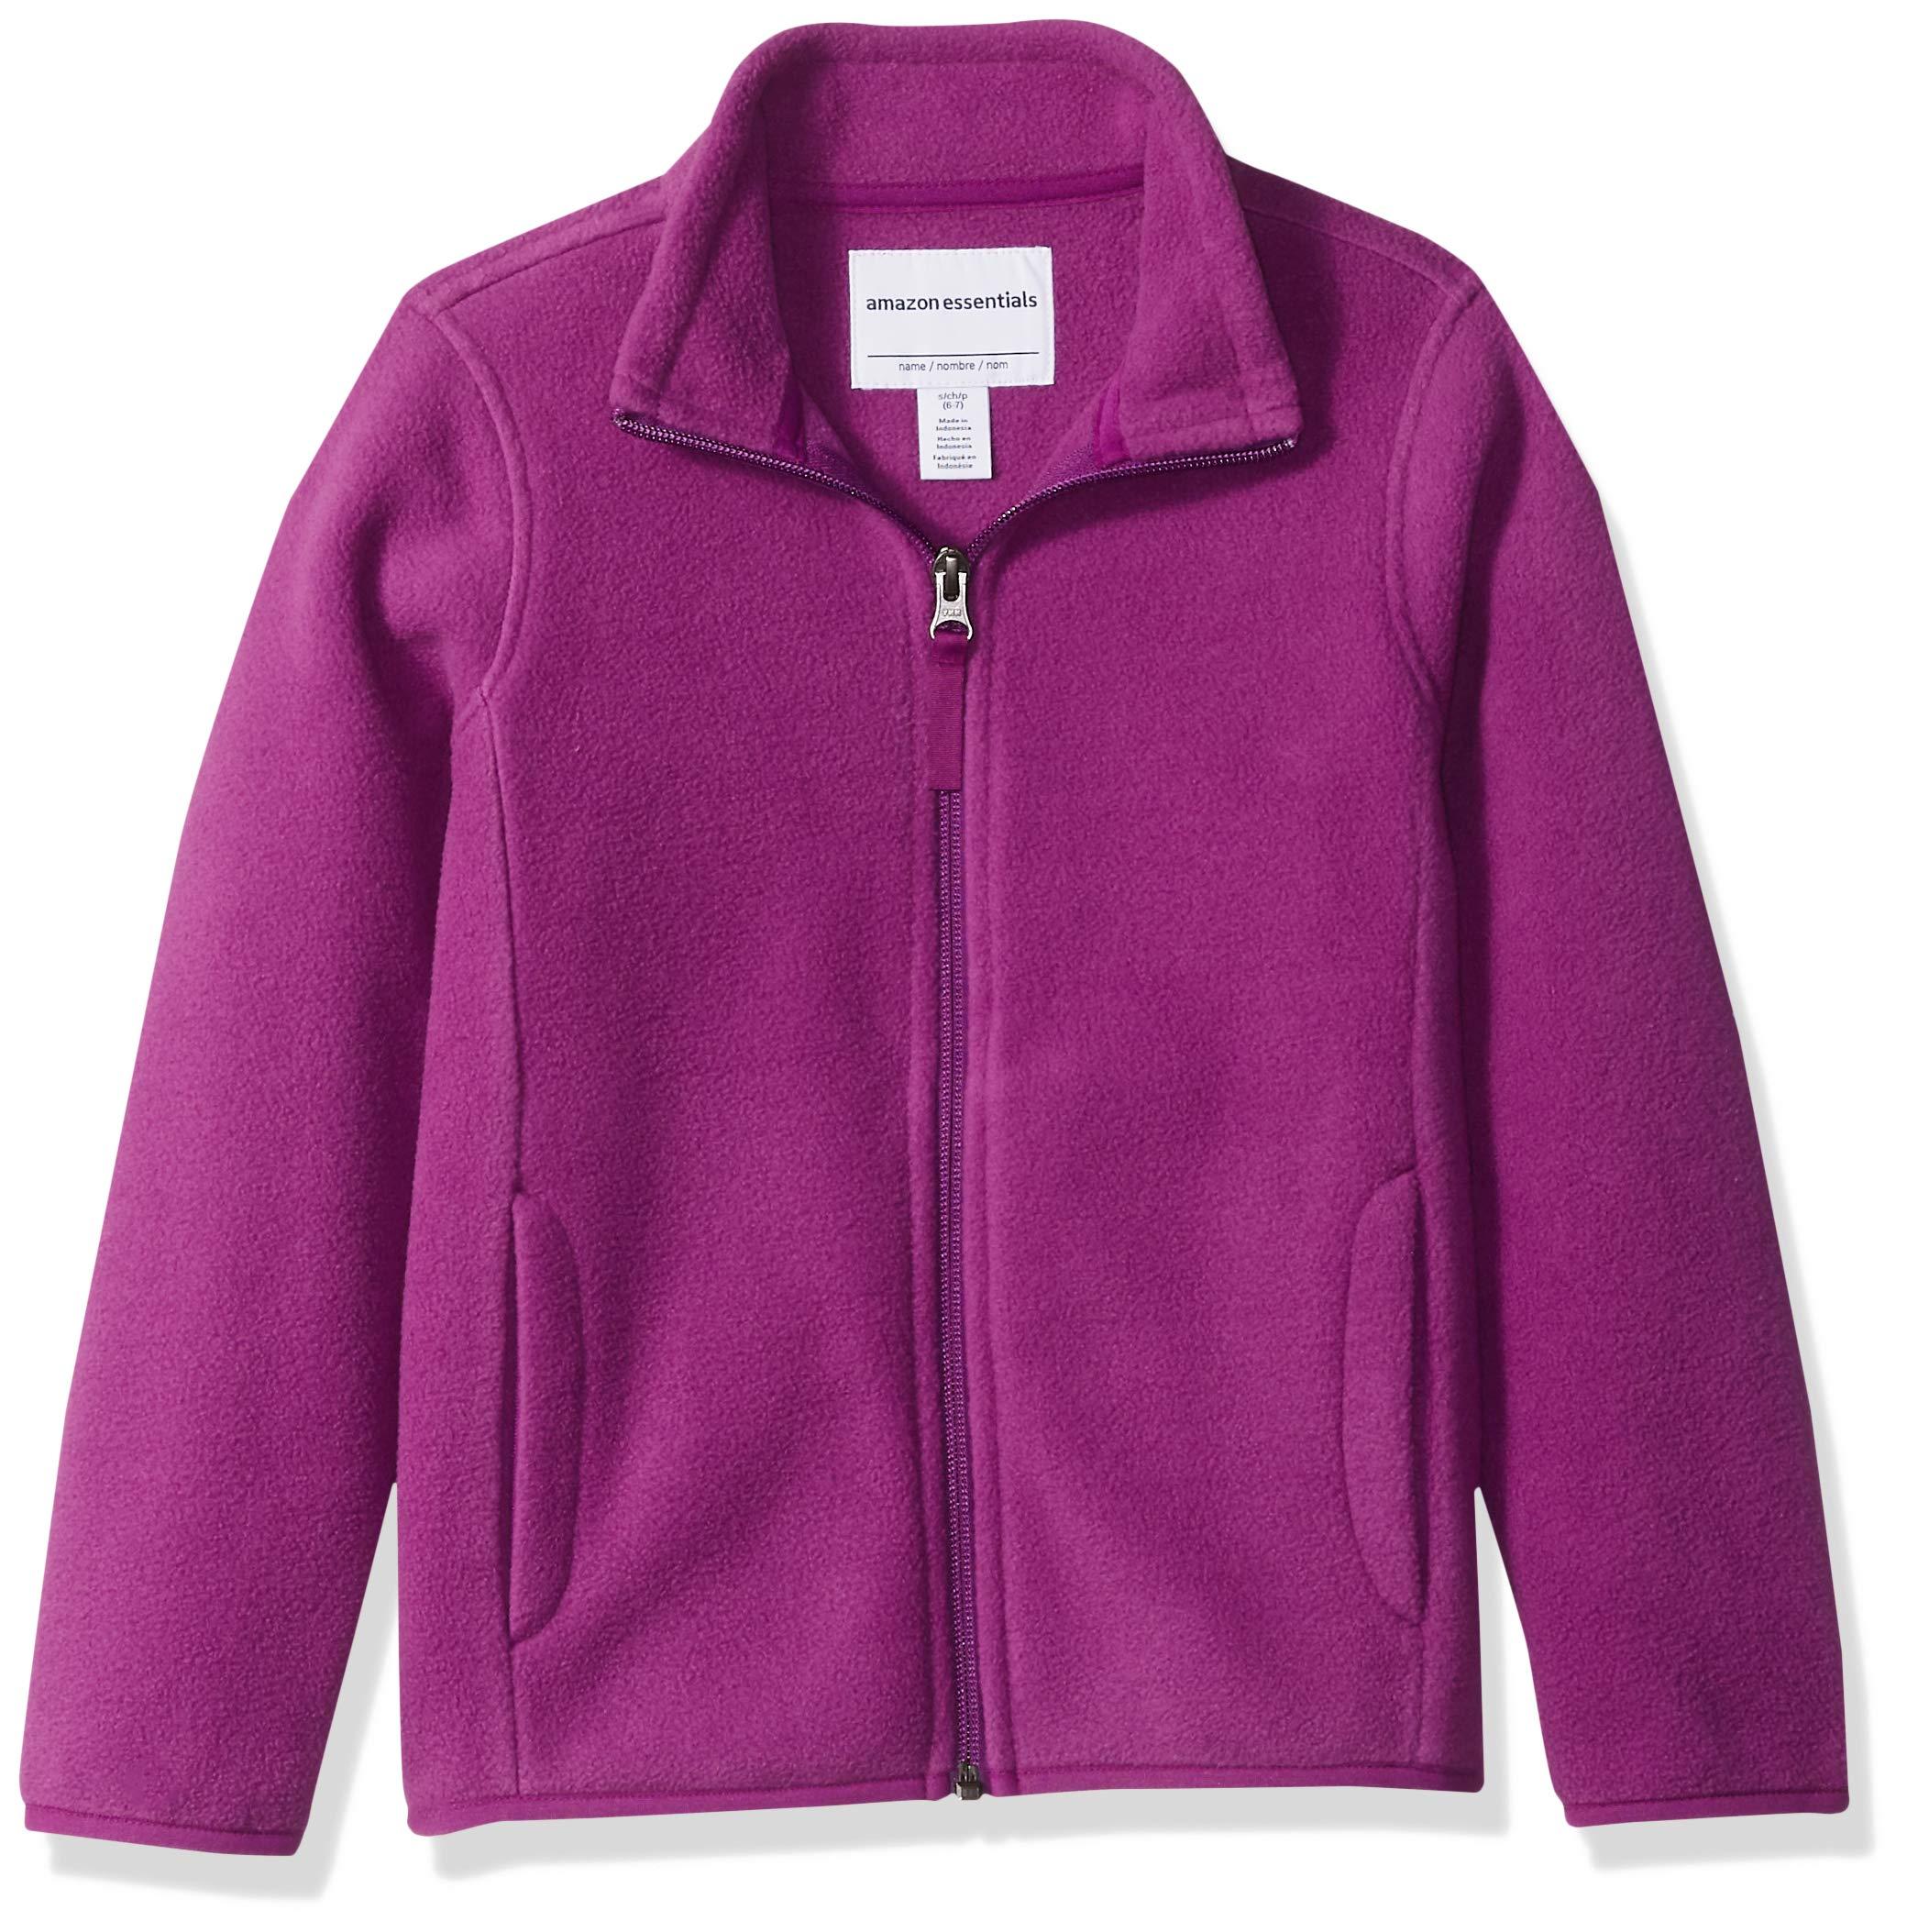 Amazon Essentials Girl's Full-Zip Polar Fleece Jacket, Plum Purple, Medium